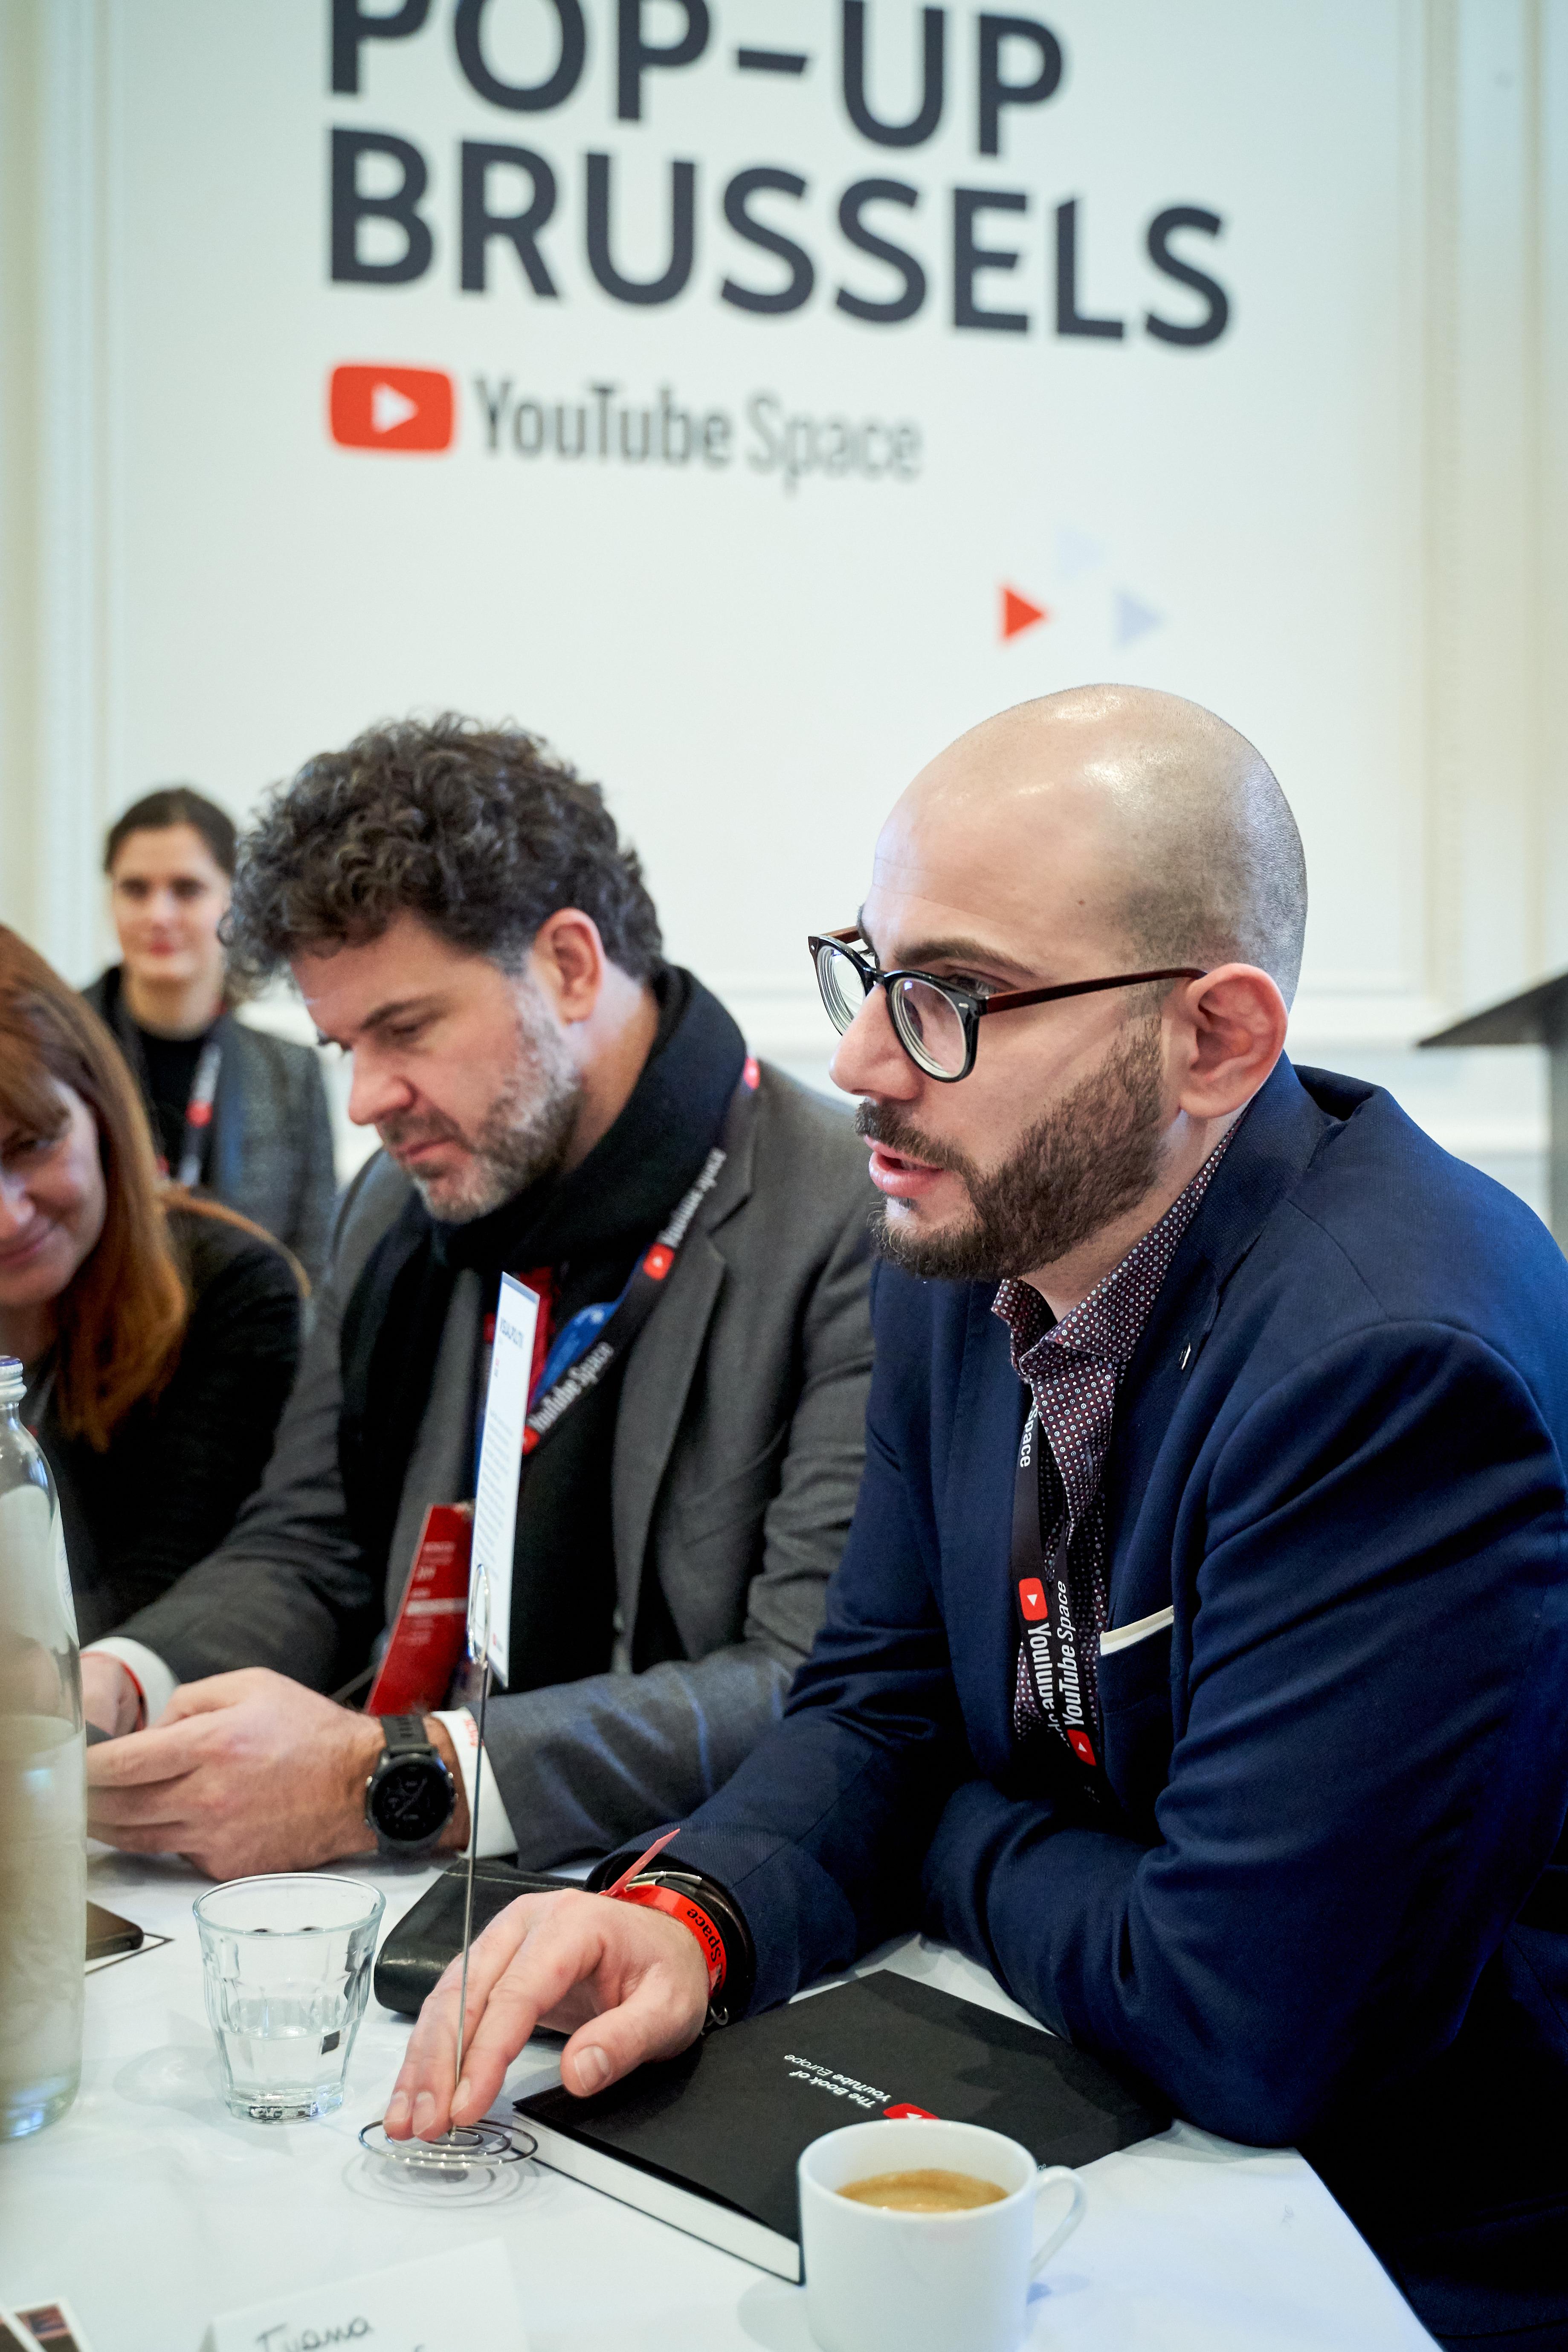 Fonseca, VisualPolitik - YouTube Pop-Up Space